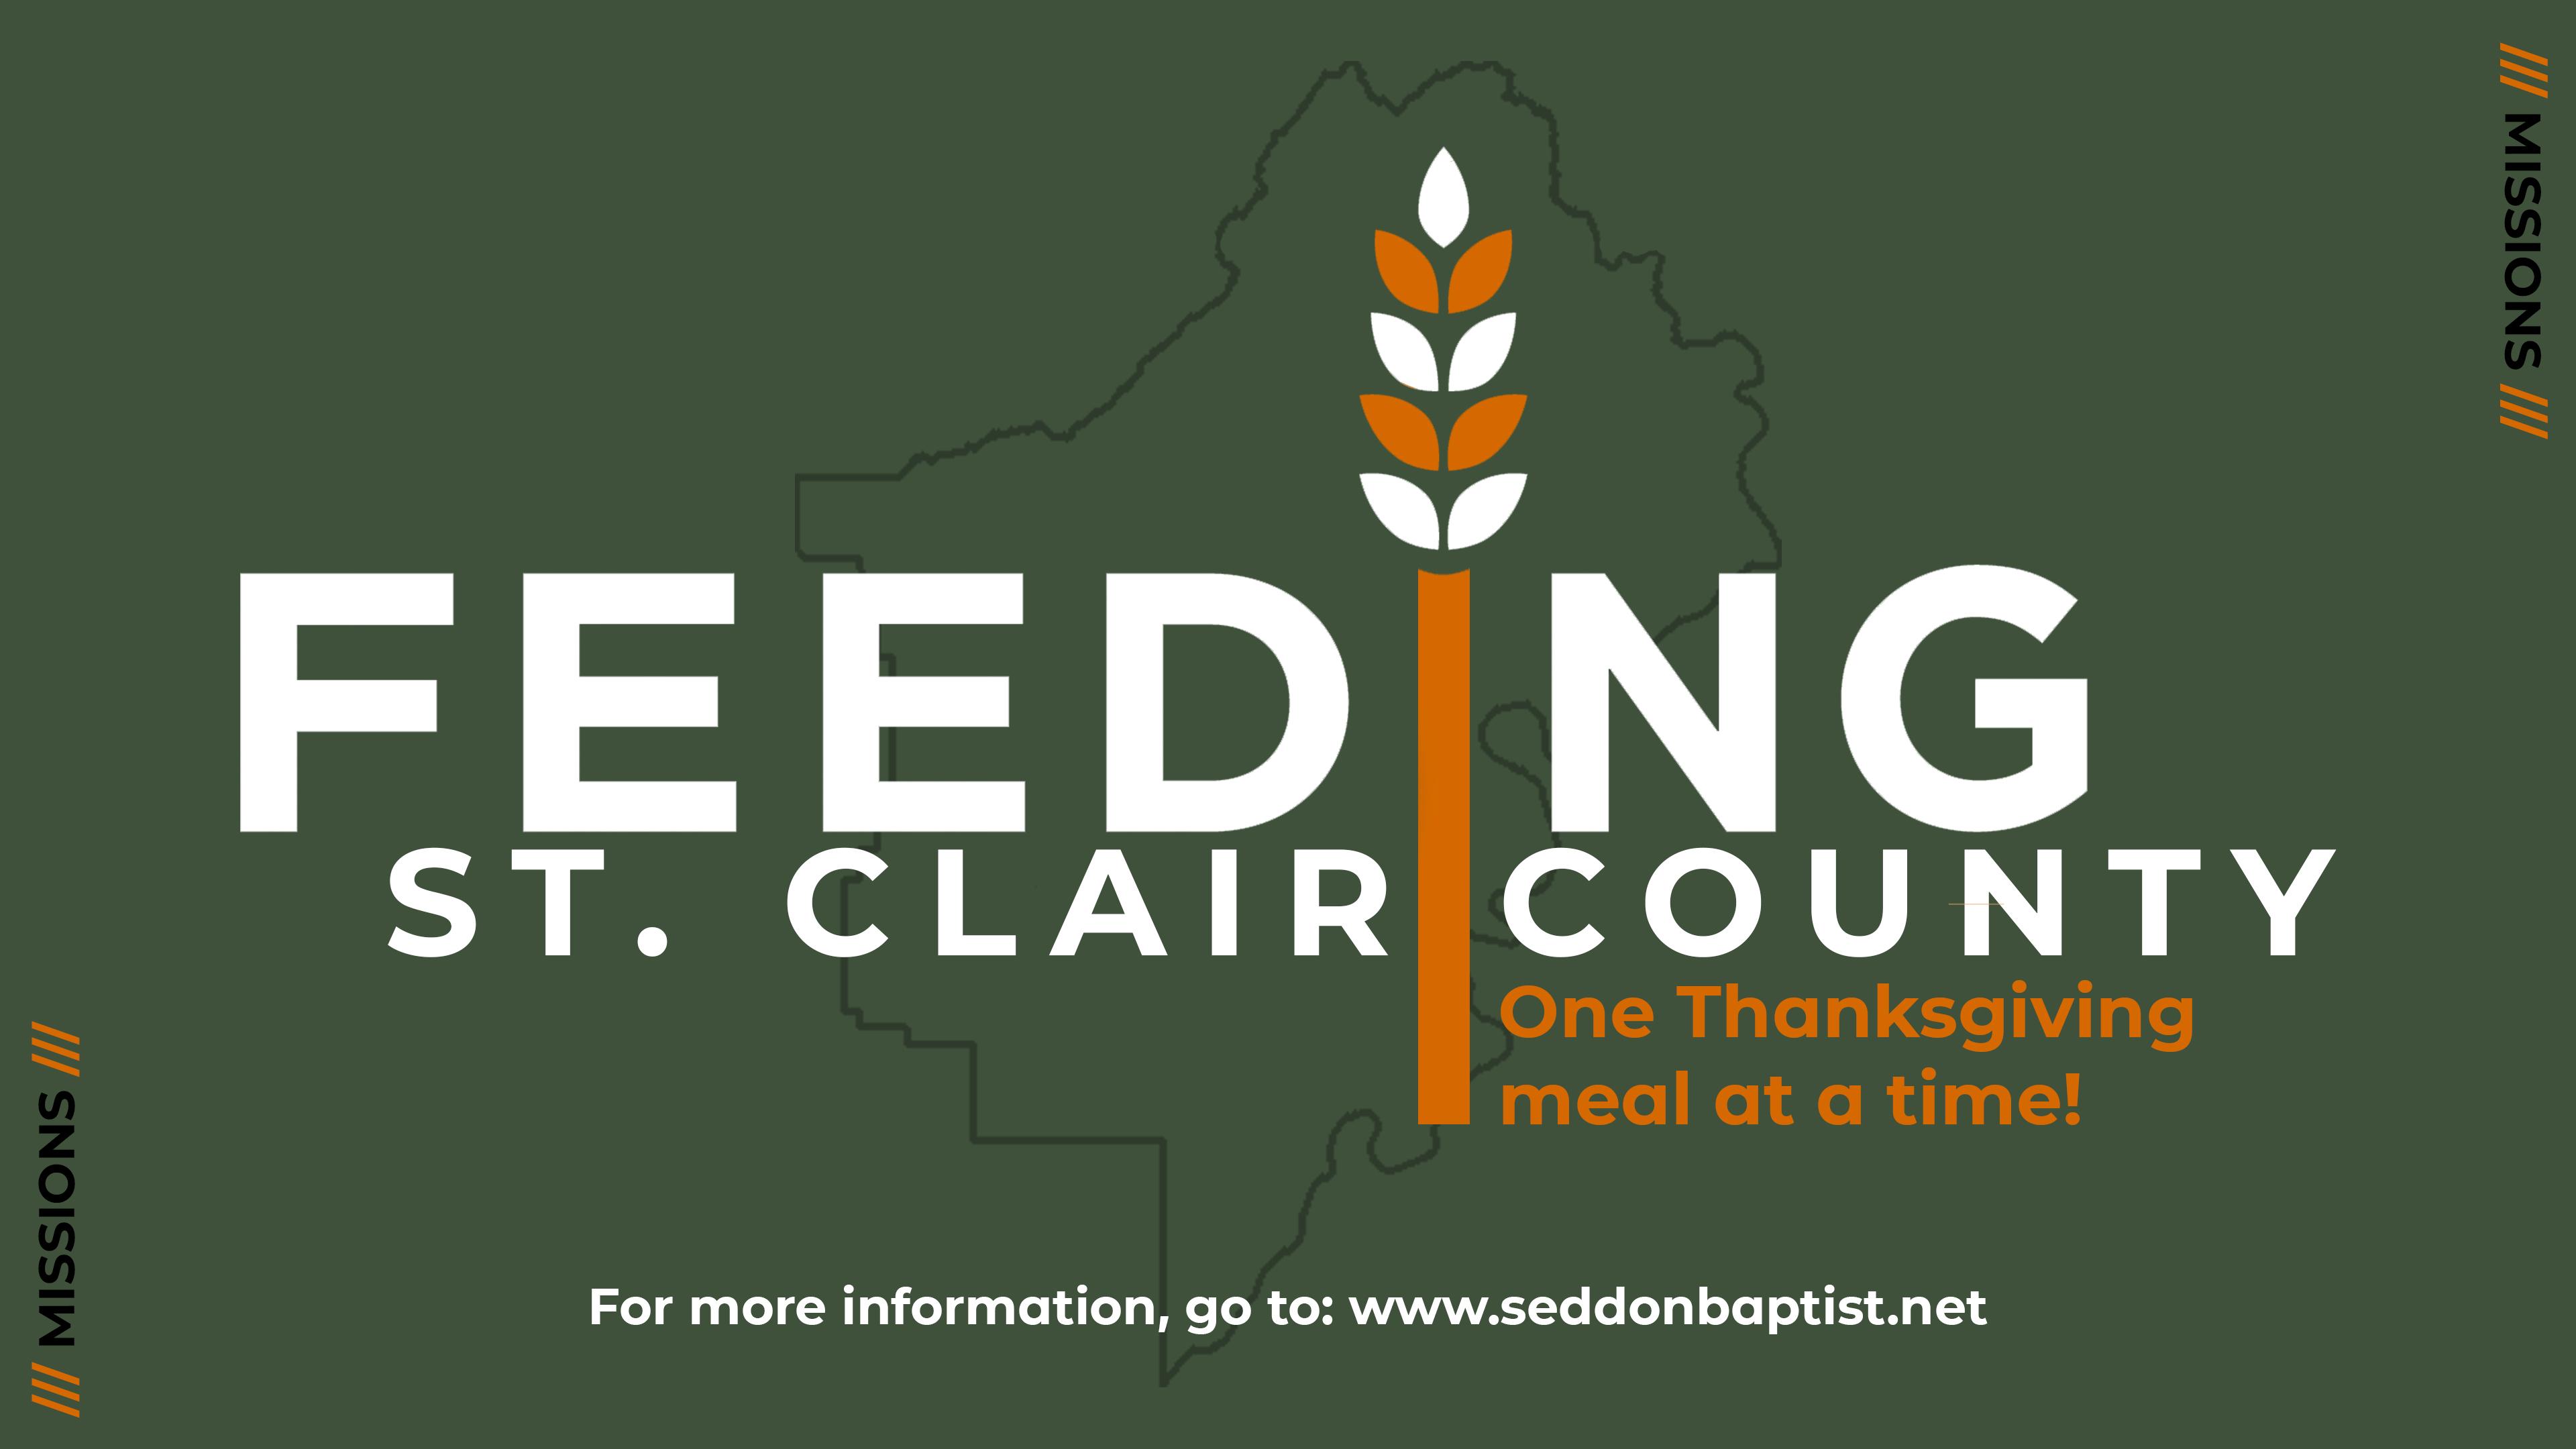 SeddonBC Missions: Feeding St. Clair County